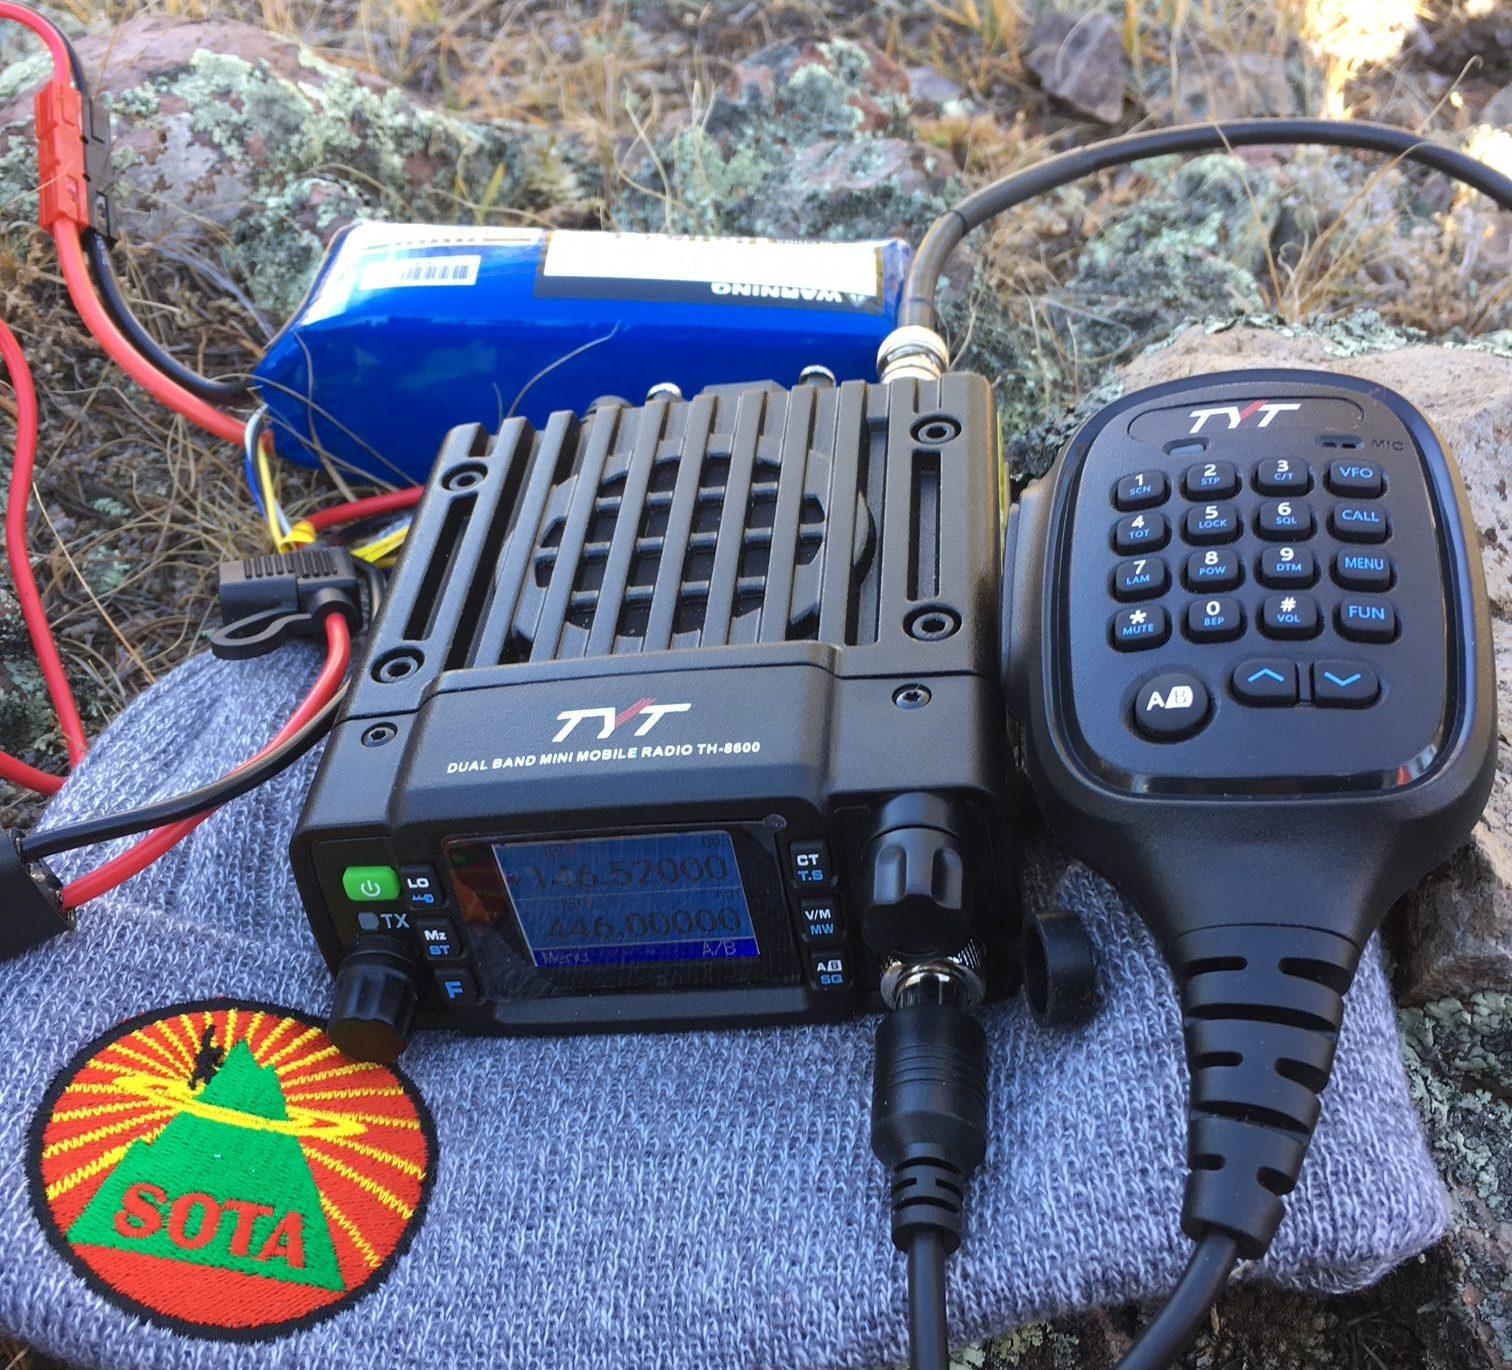 Ham Radio Transmitters Czh Cze7c Fm Transmitter Mini Circuits Gt 5 3w Amplifier With Surround System L36272 Nextgr 1n3044bmpf910mtp12n10 Circuit 80 M Amateur